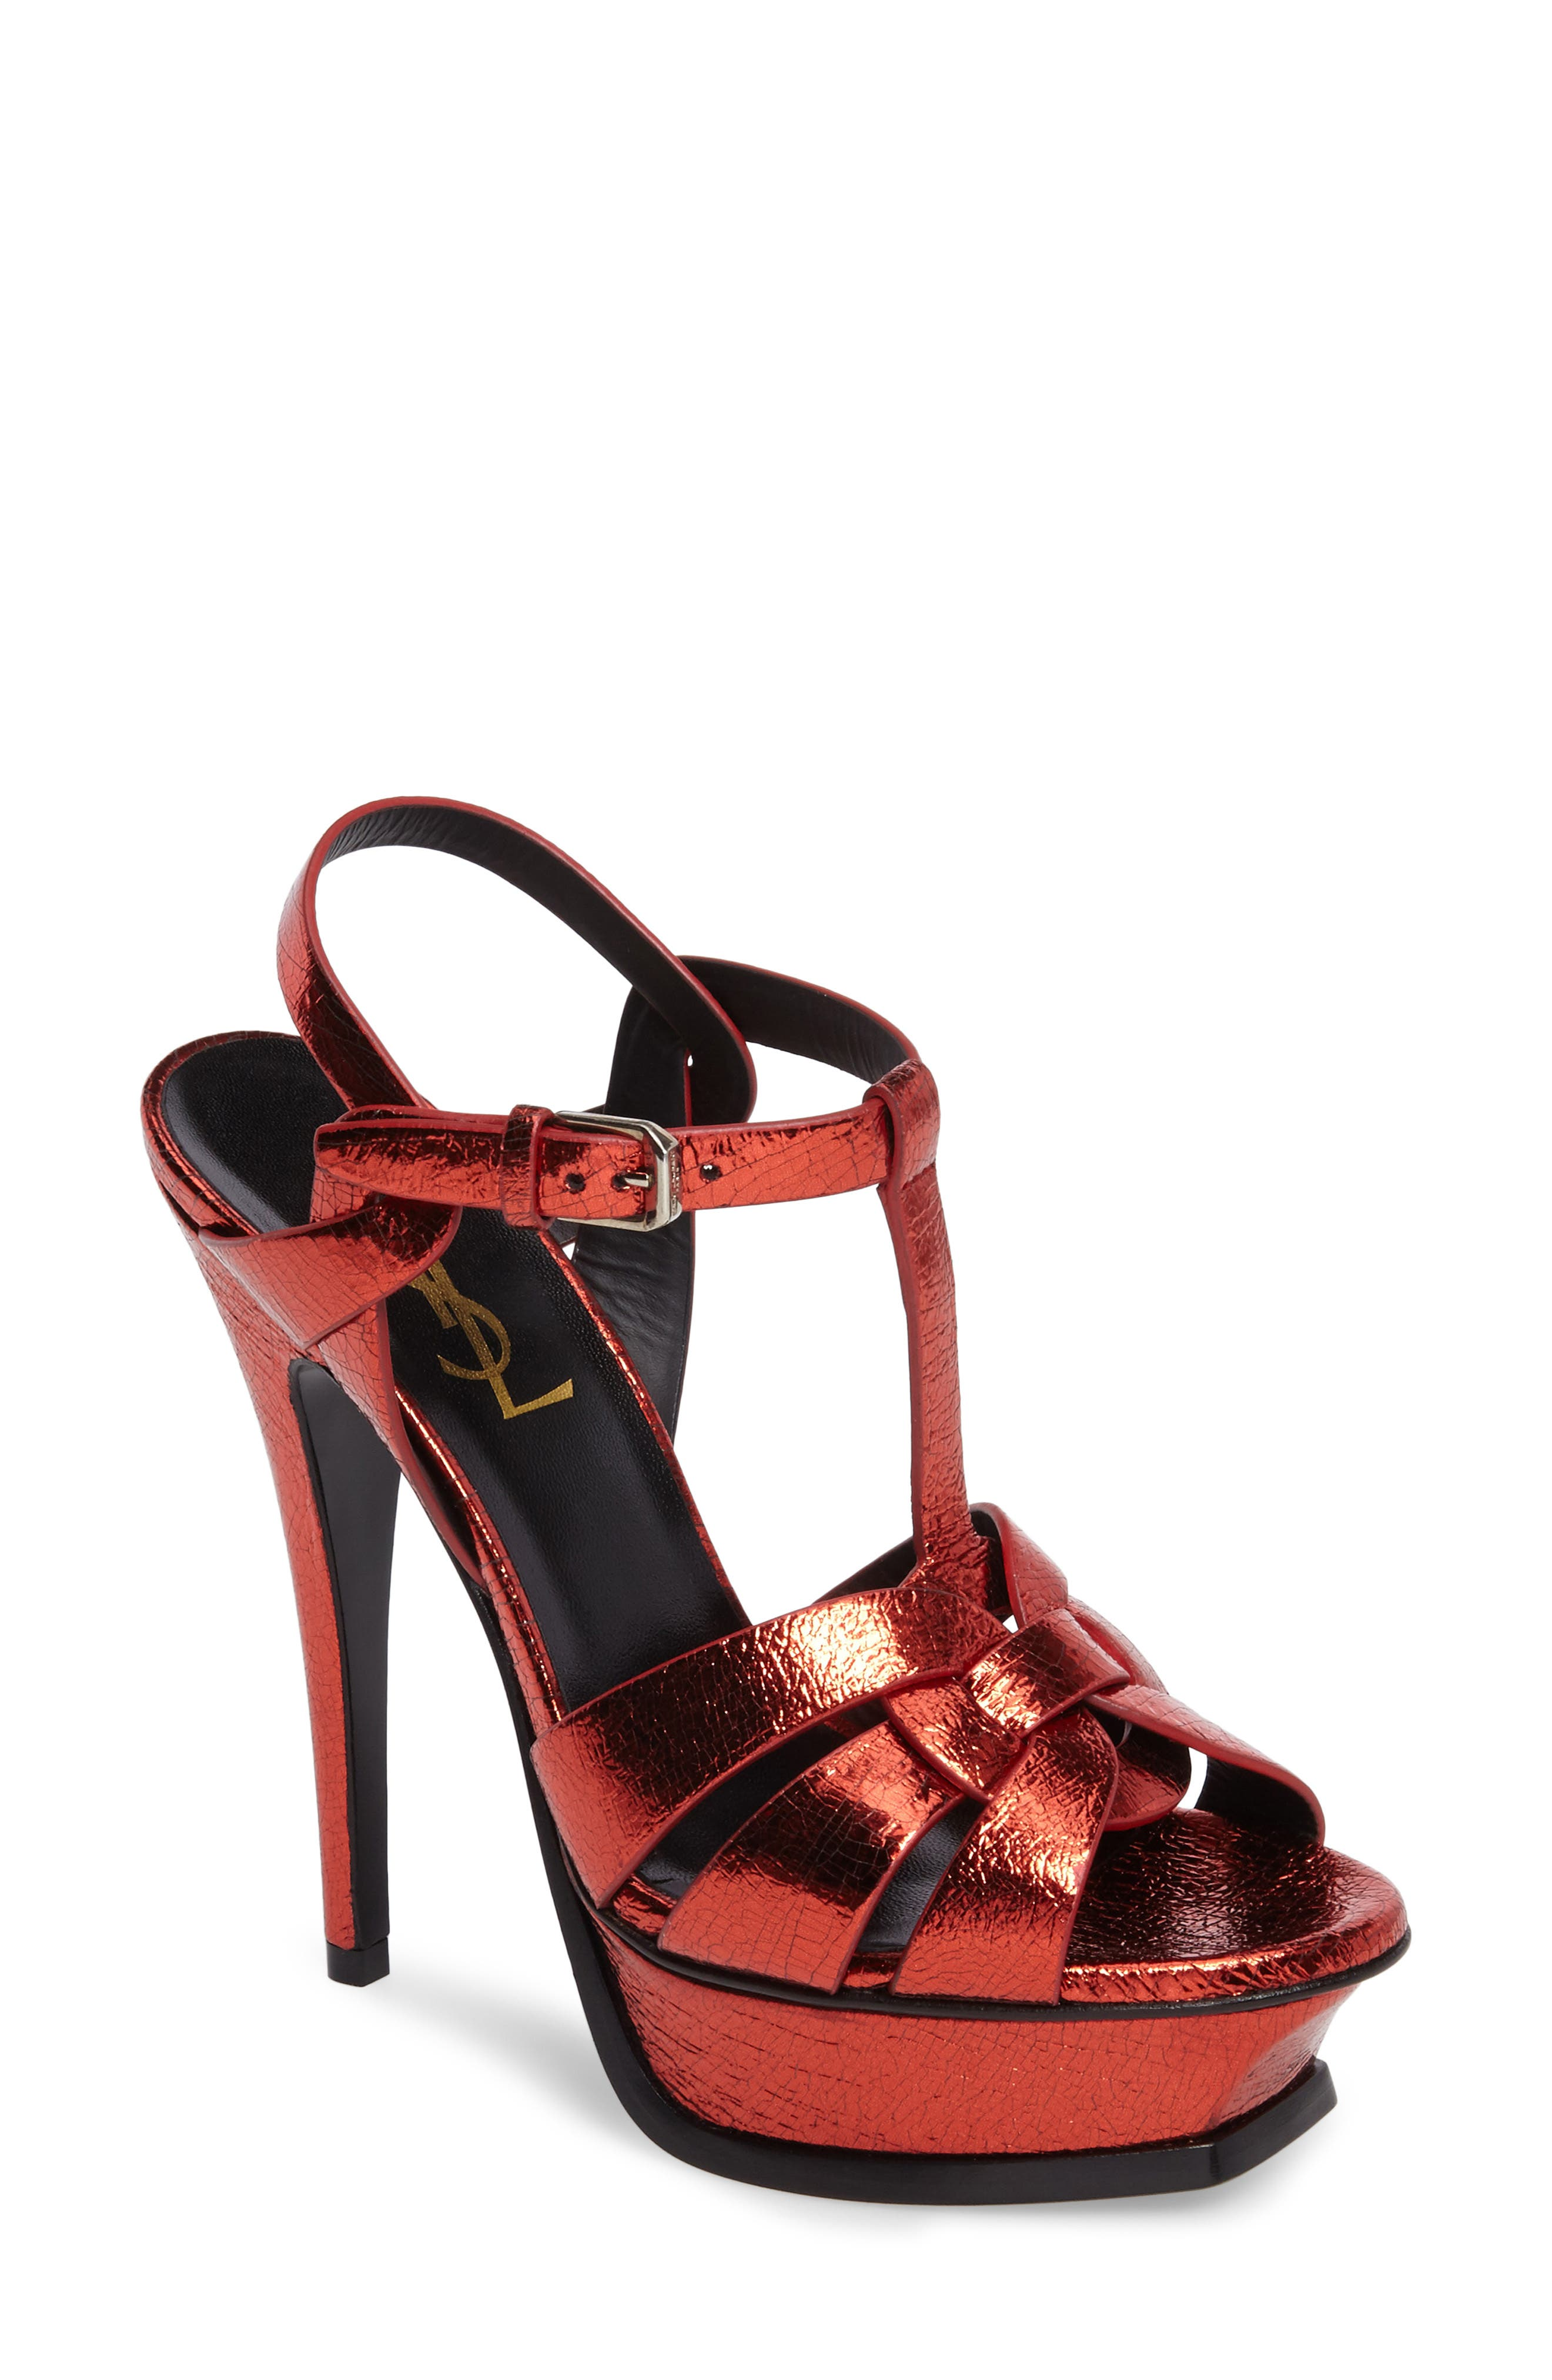 Main Image - Saint Laurent Tribute Metallic Platform Sandal (Women)